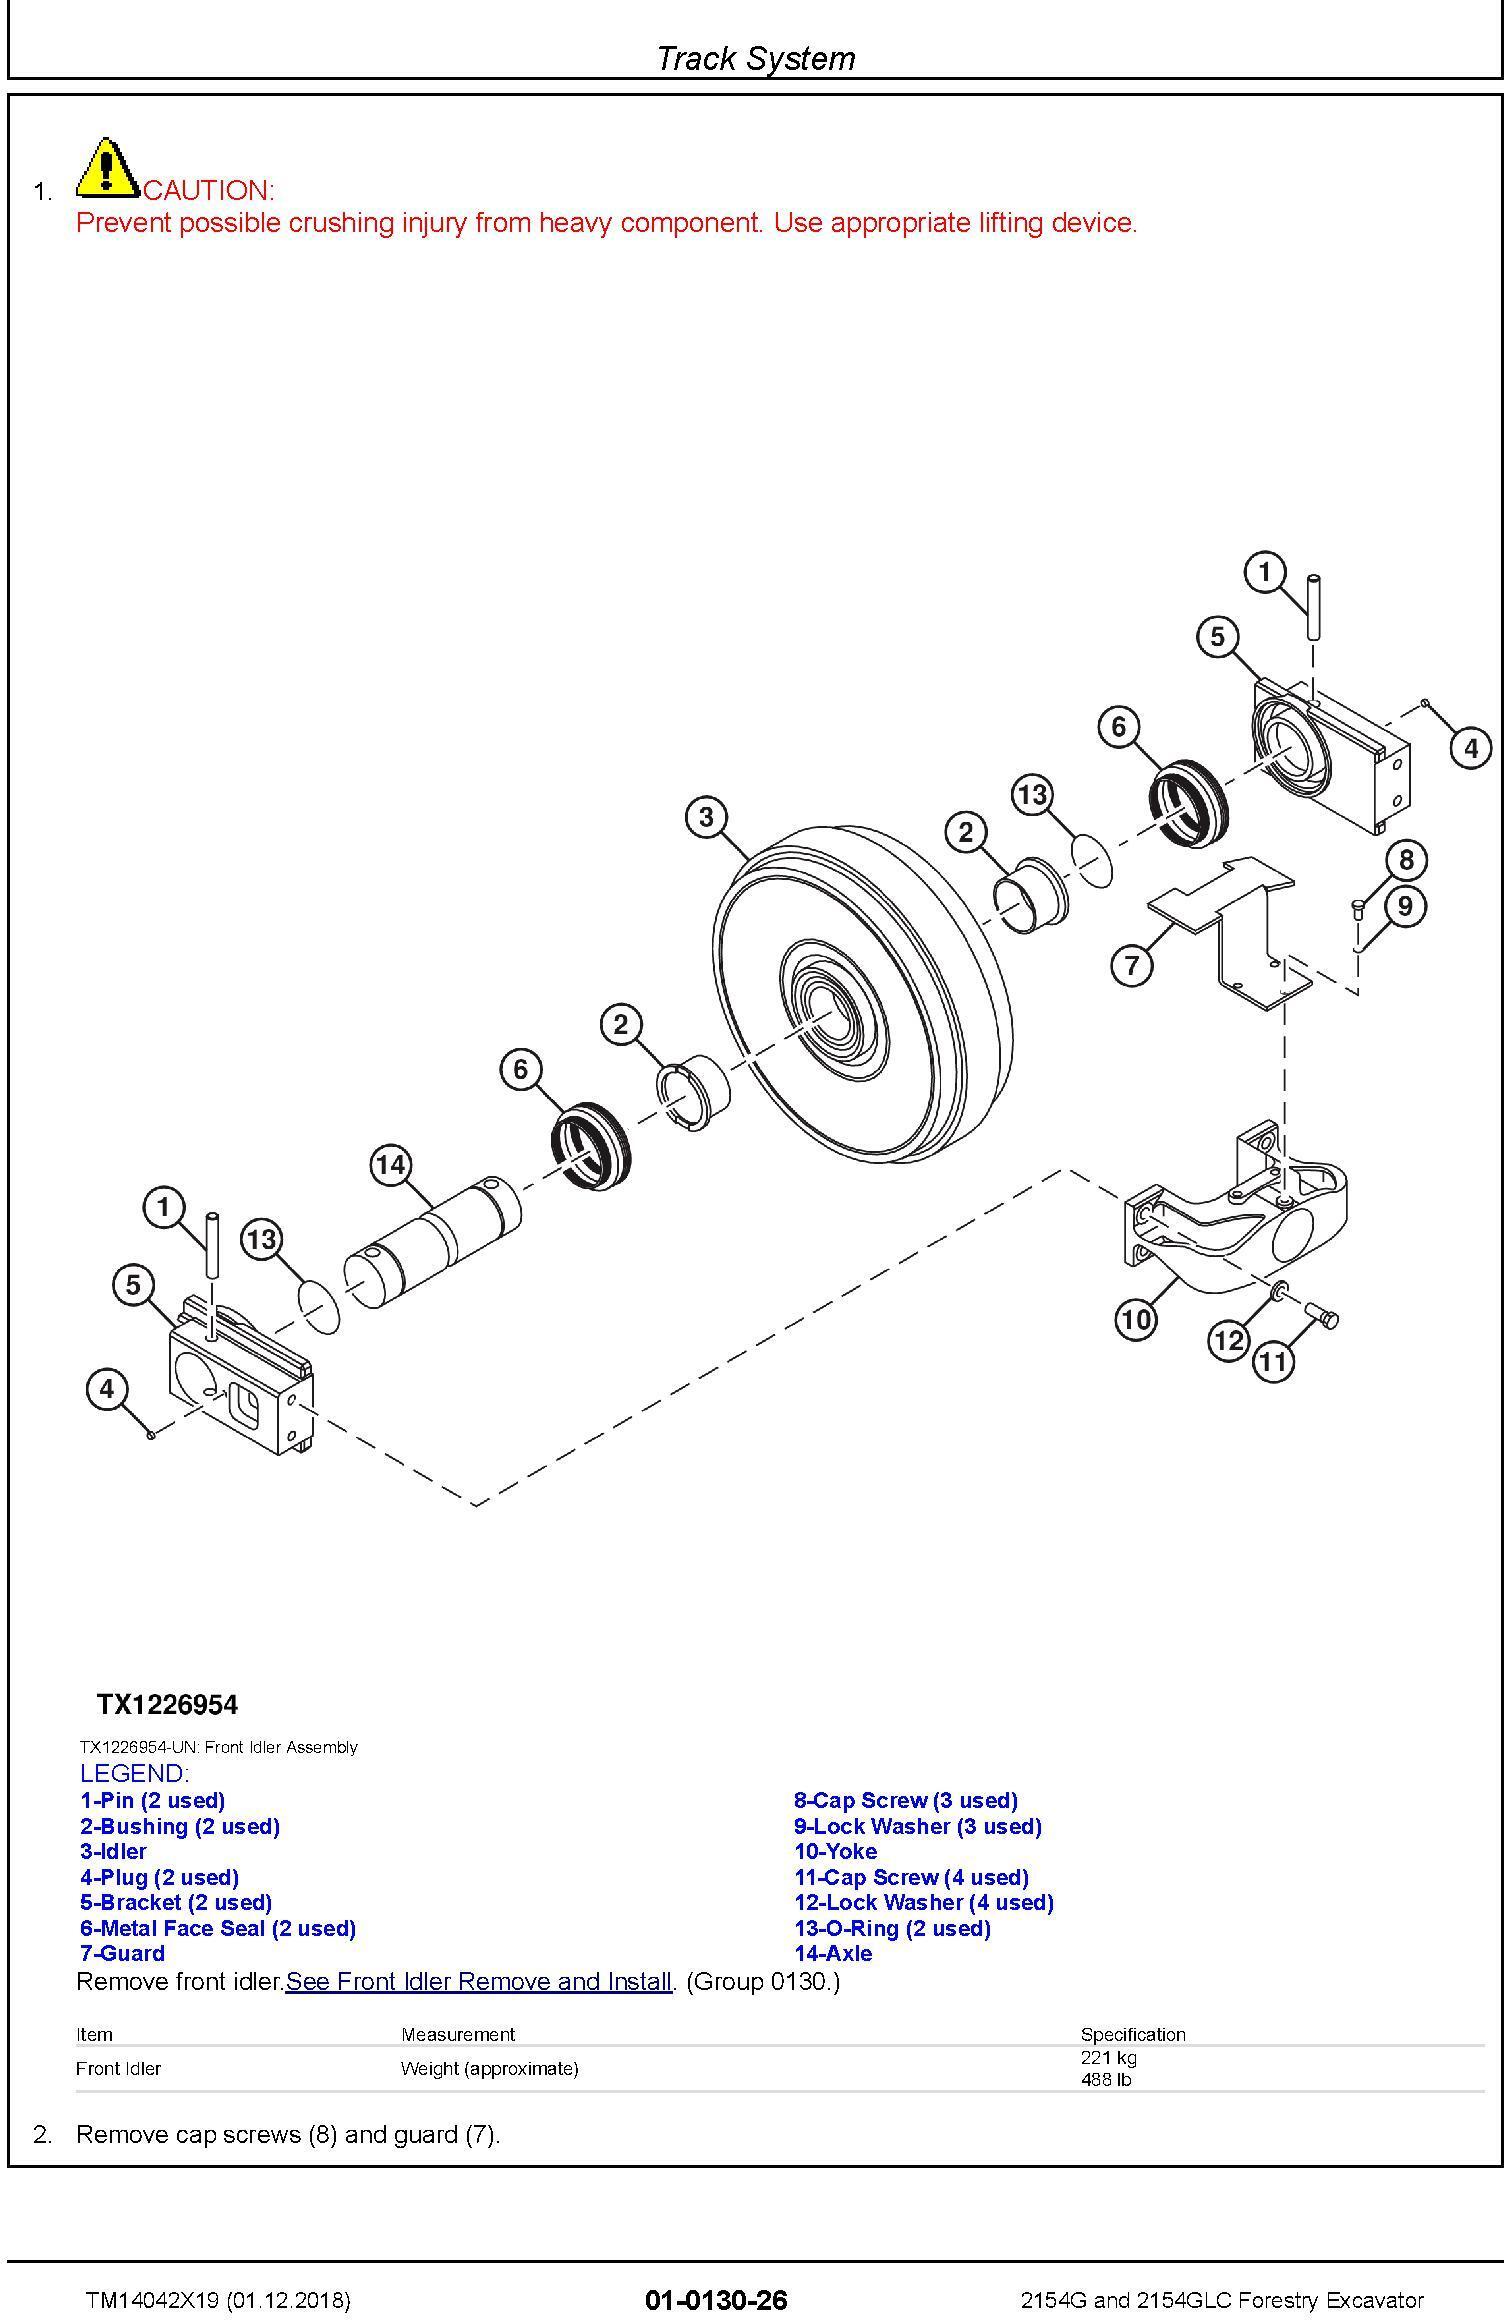 John Deere 2154G, 2154GLC (SN. F212400-) Forestry Excavator Repair Technical Manual (TM14042X19) - 2